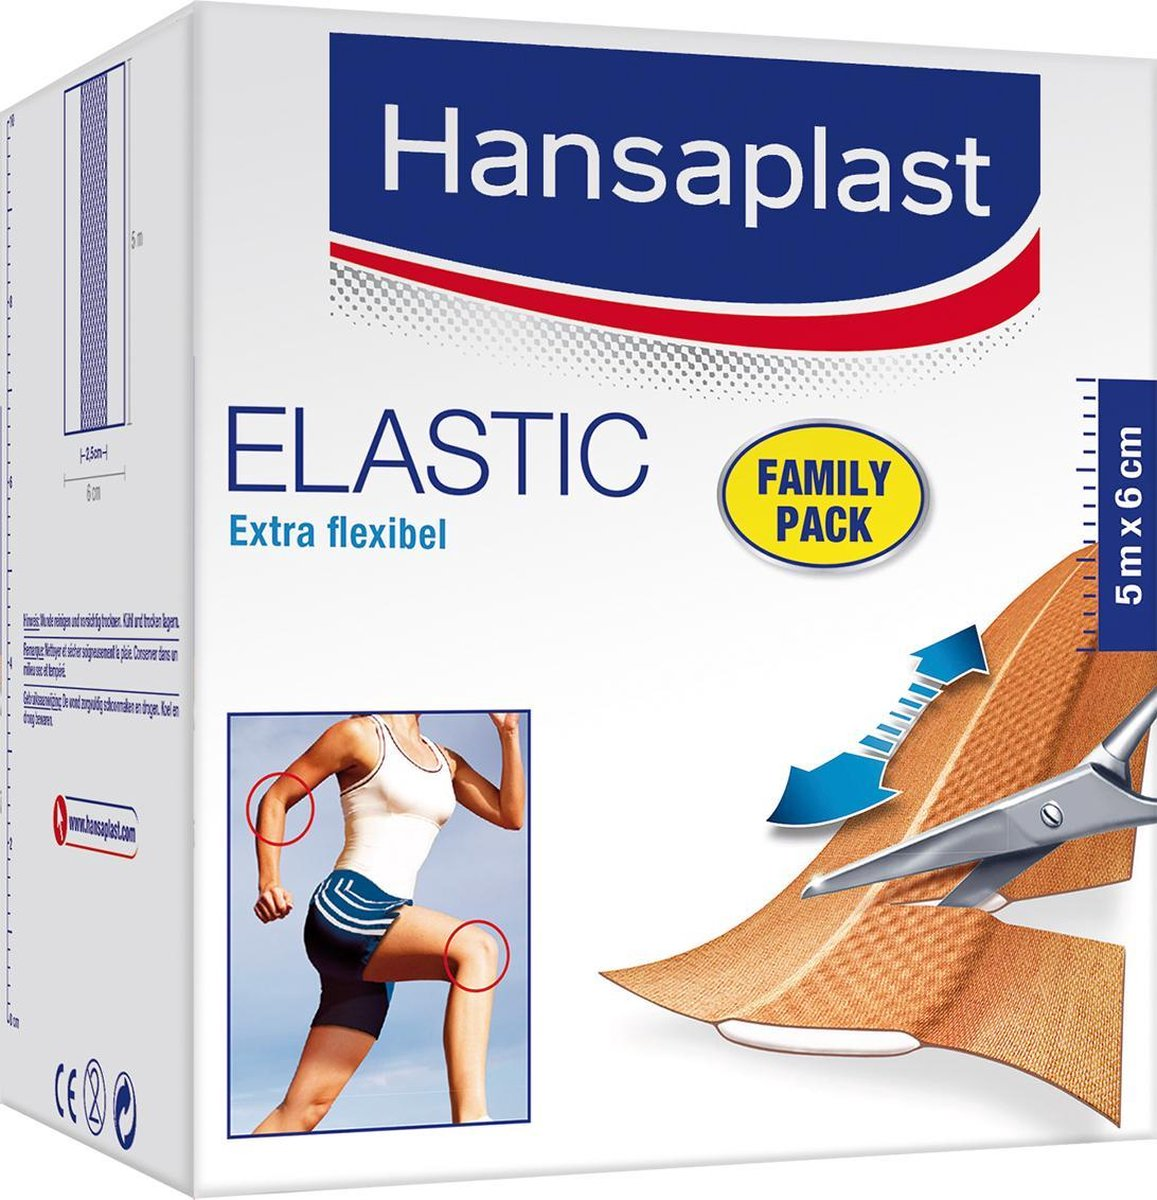 Hansaplast Elastic Family Pack Pleisters - 5m x 6cm